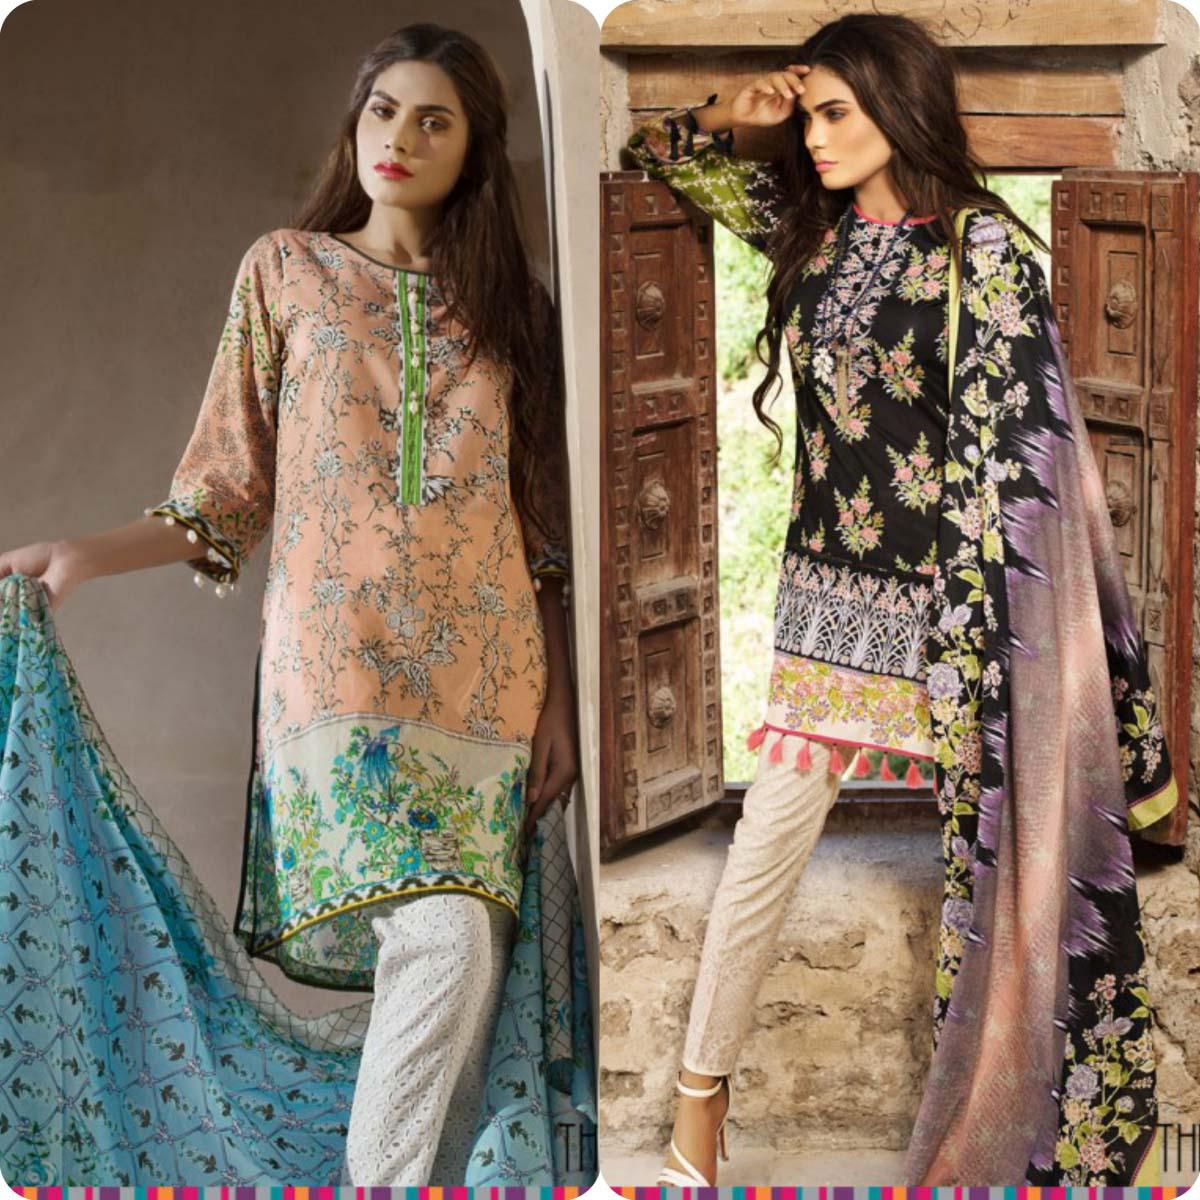 Stylish Embroidered Eid KurtisTunics for Girls By THREDZ 2016-2016 Complete Look-Book (10)